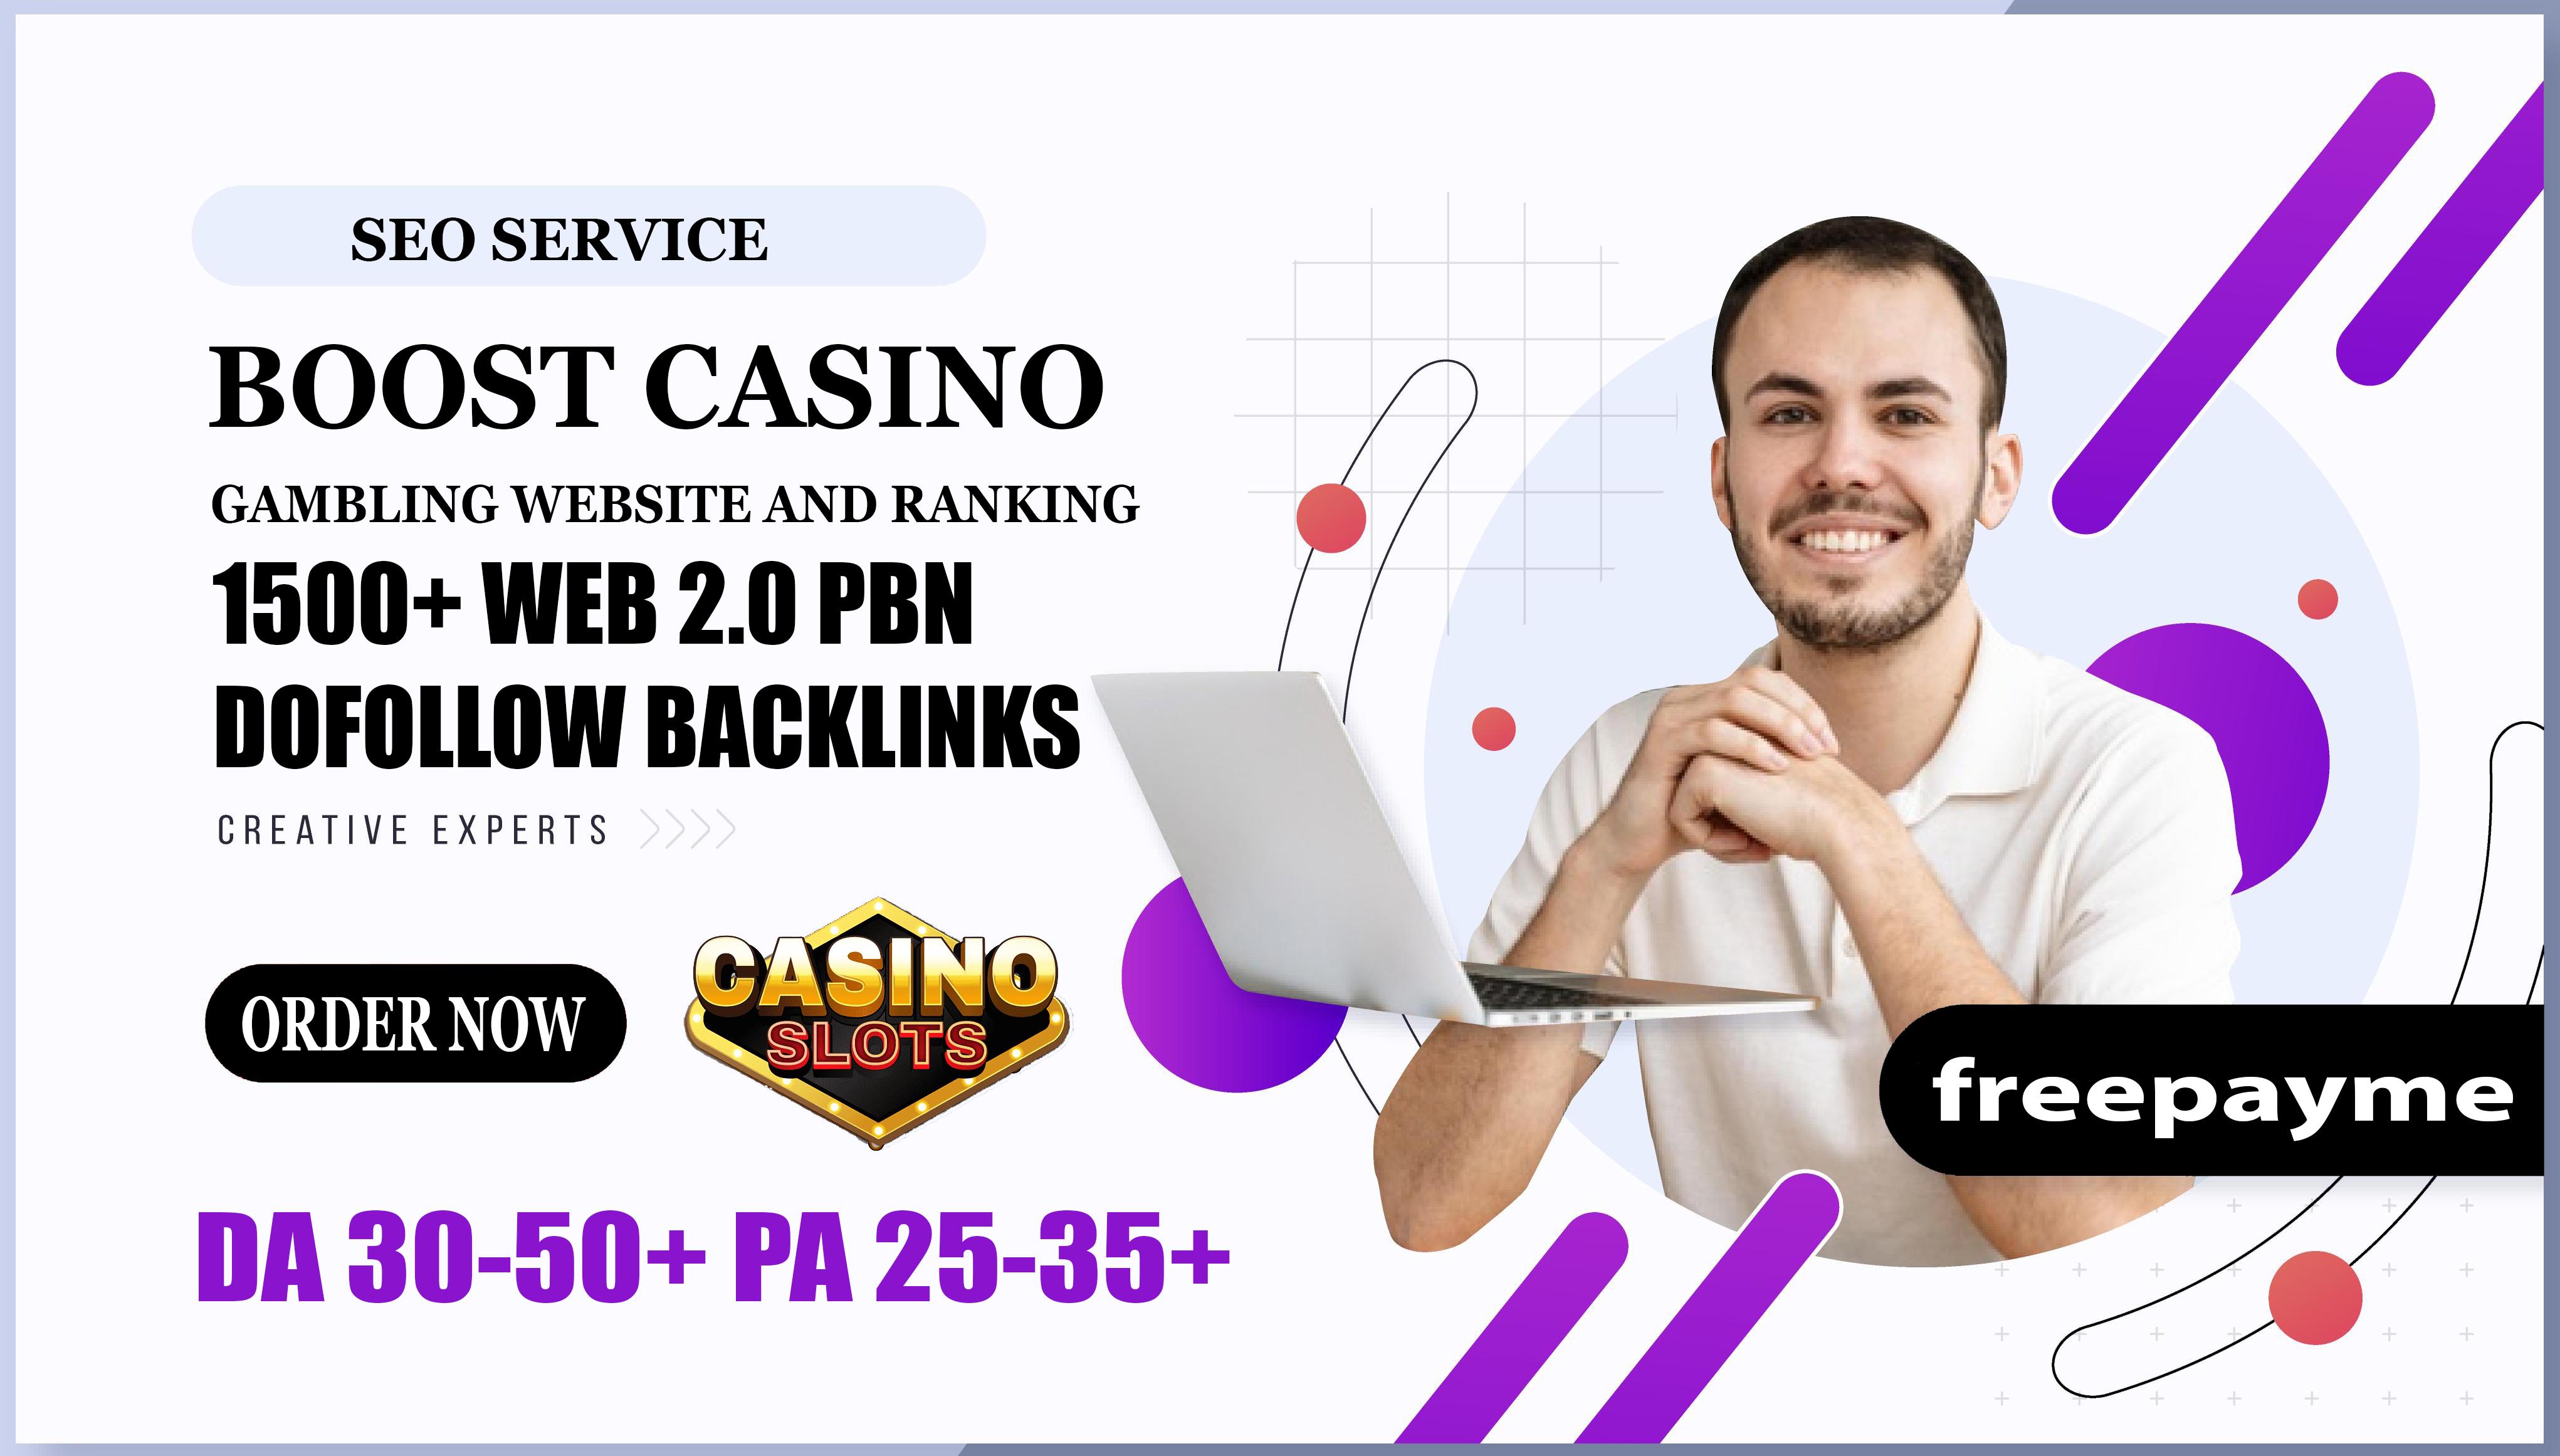 I will do 1500+ Web 2.0 PBN Dofollow Backlinks Boost Casino Gambling Website And Ranking